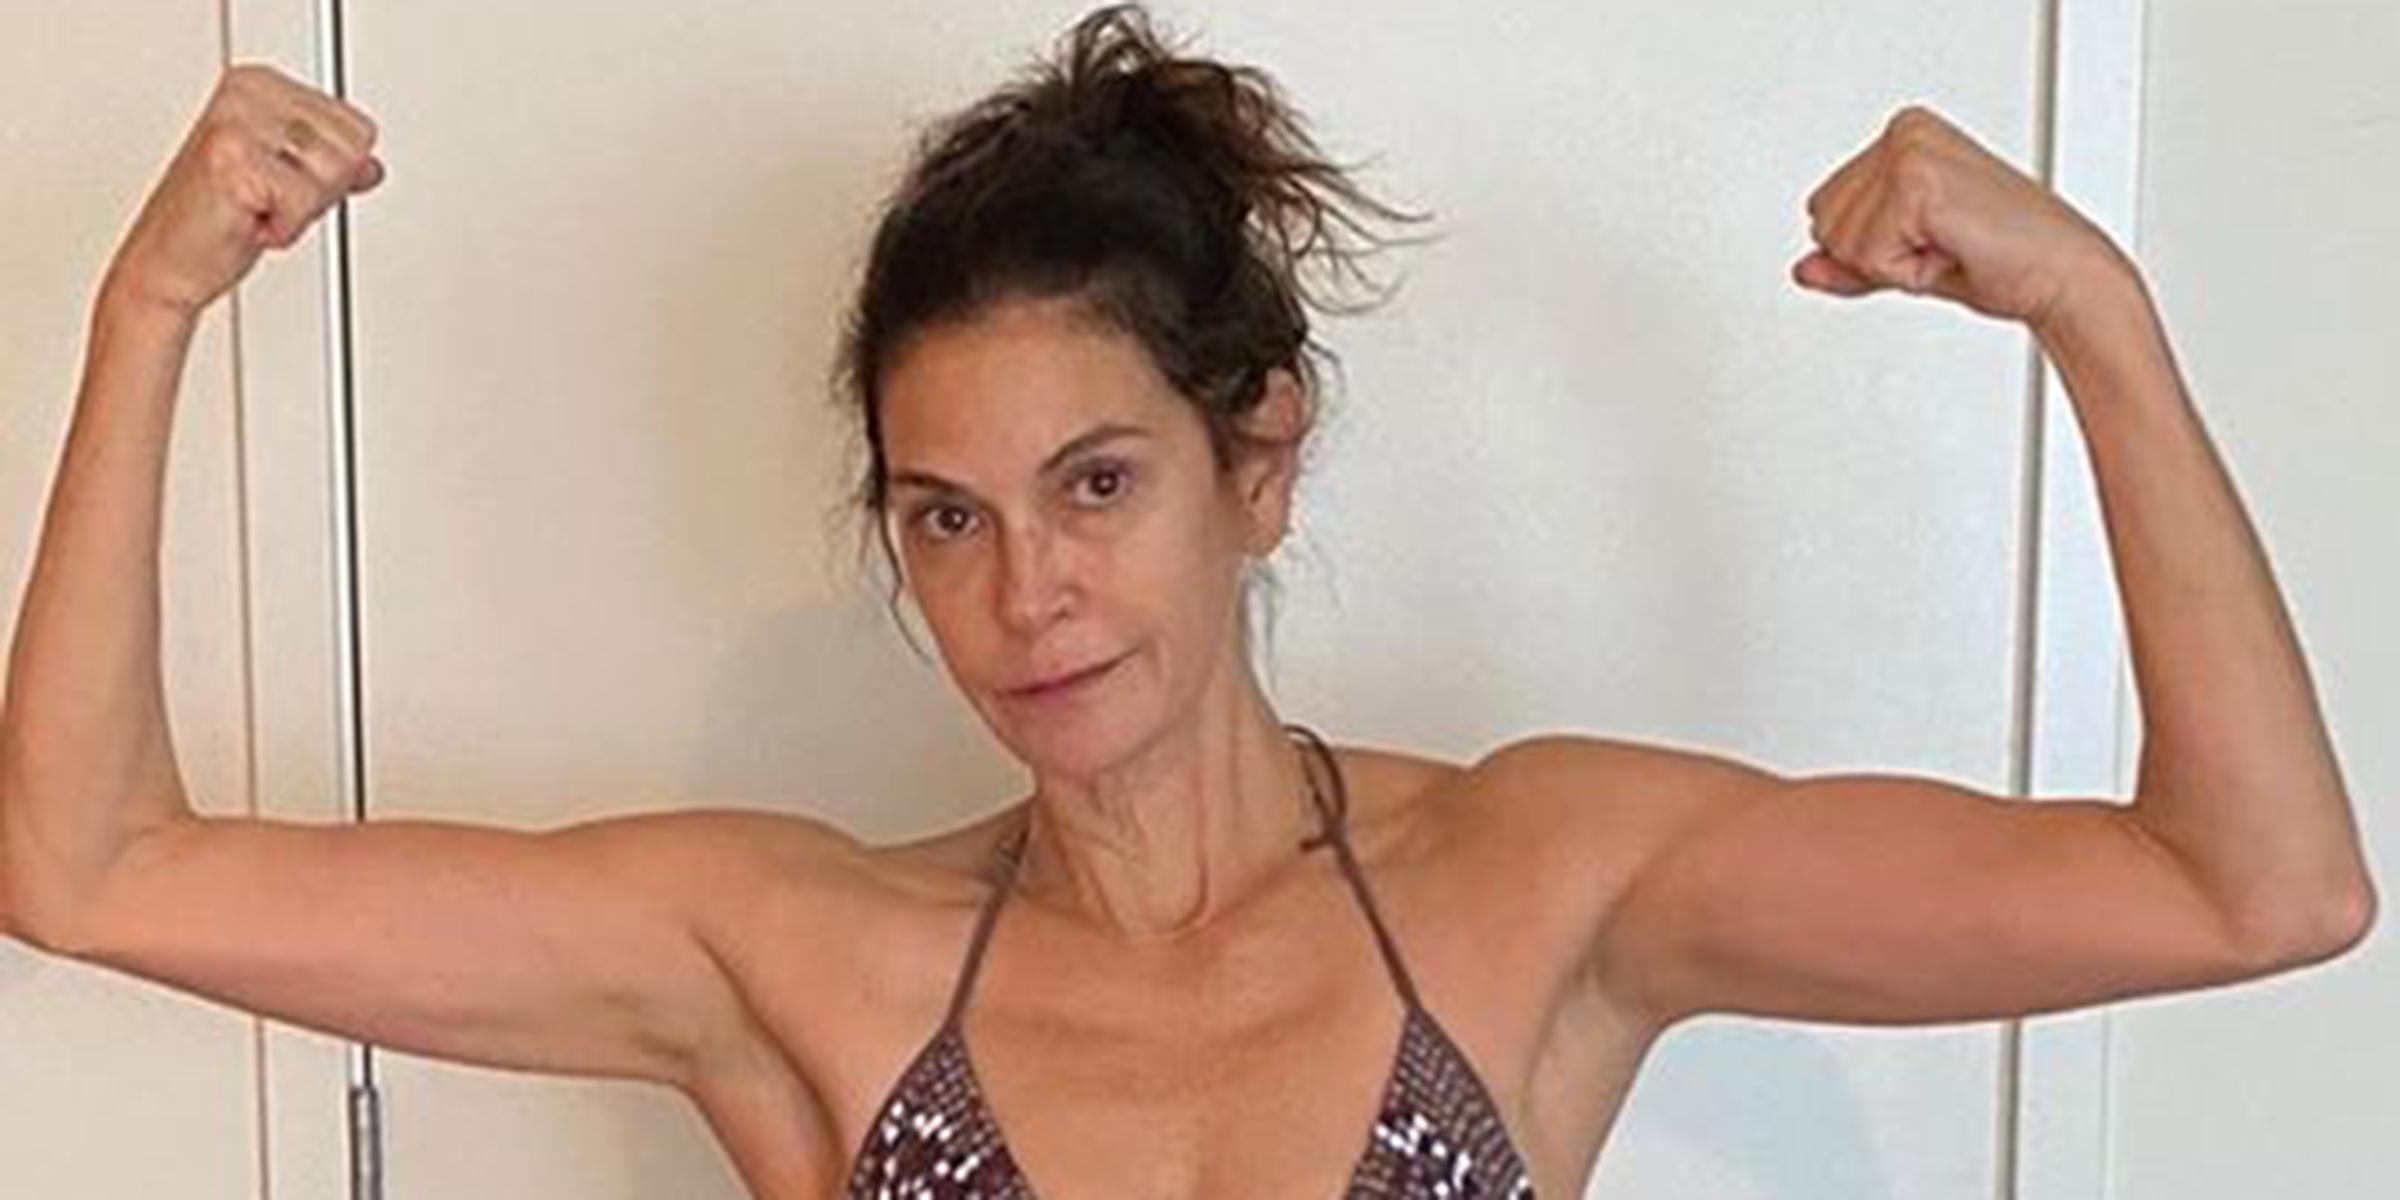 Teri Hatcher, 55, shares body positive bikini photo